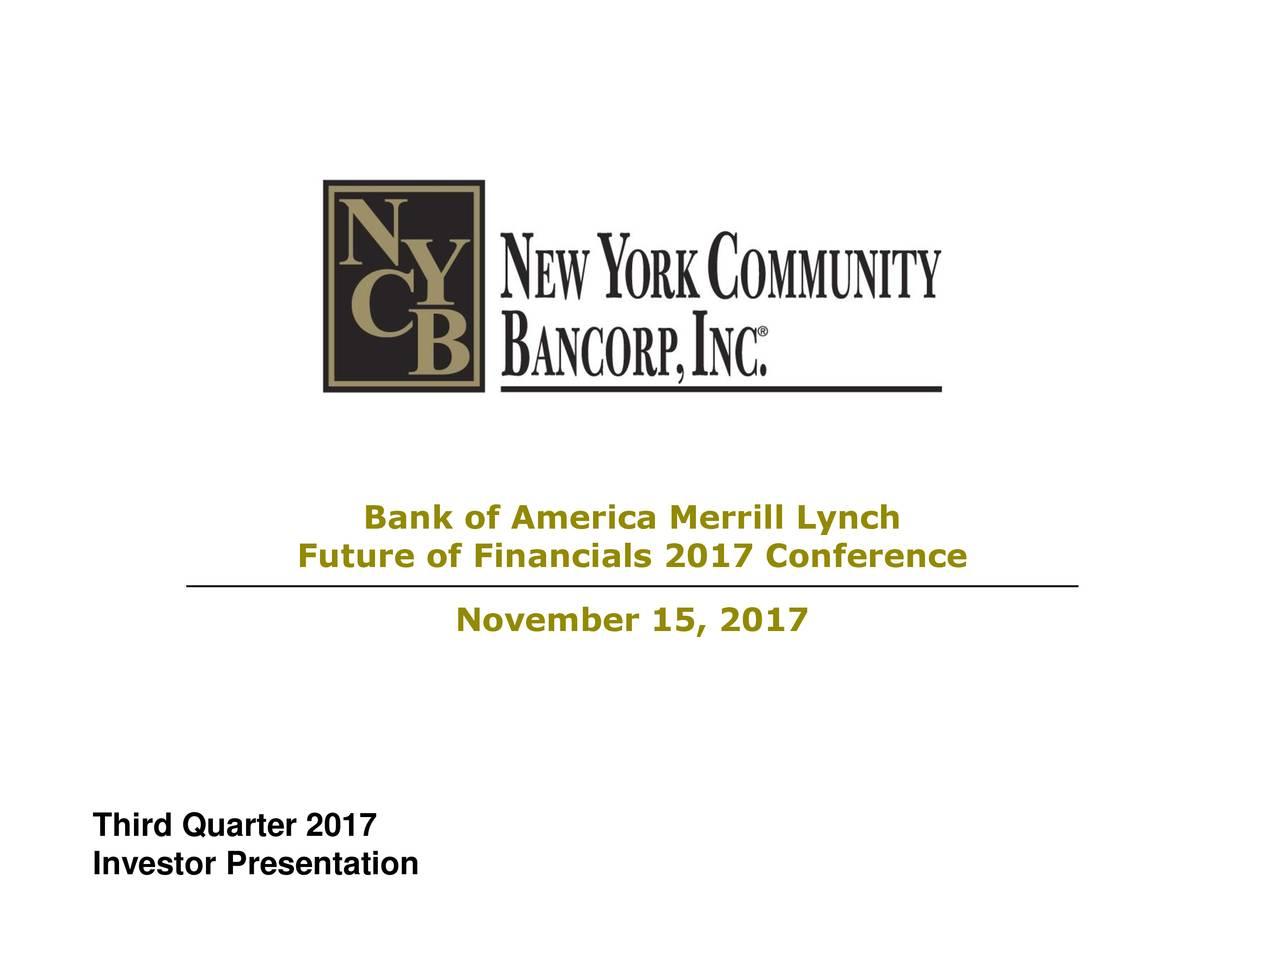 New york community nycb presents at bank of america merrill lynch future of financials 2017 conference november 15 2017 third quarter 2017 investor presentation publicscrutiny Image collections